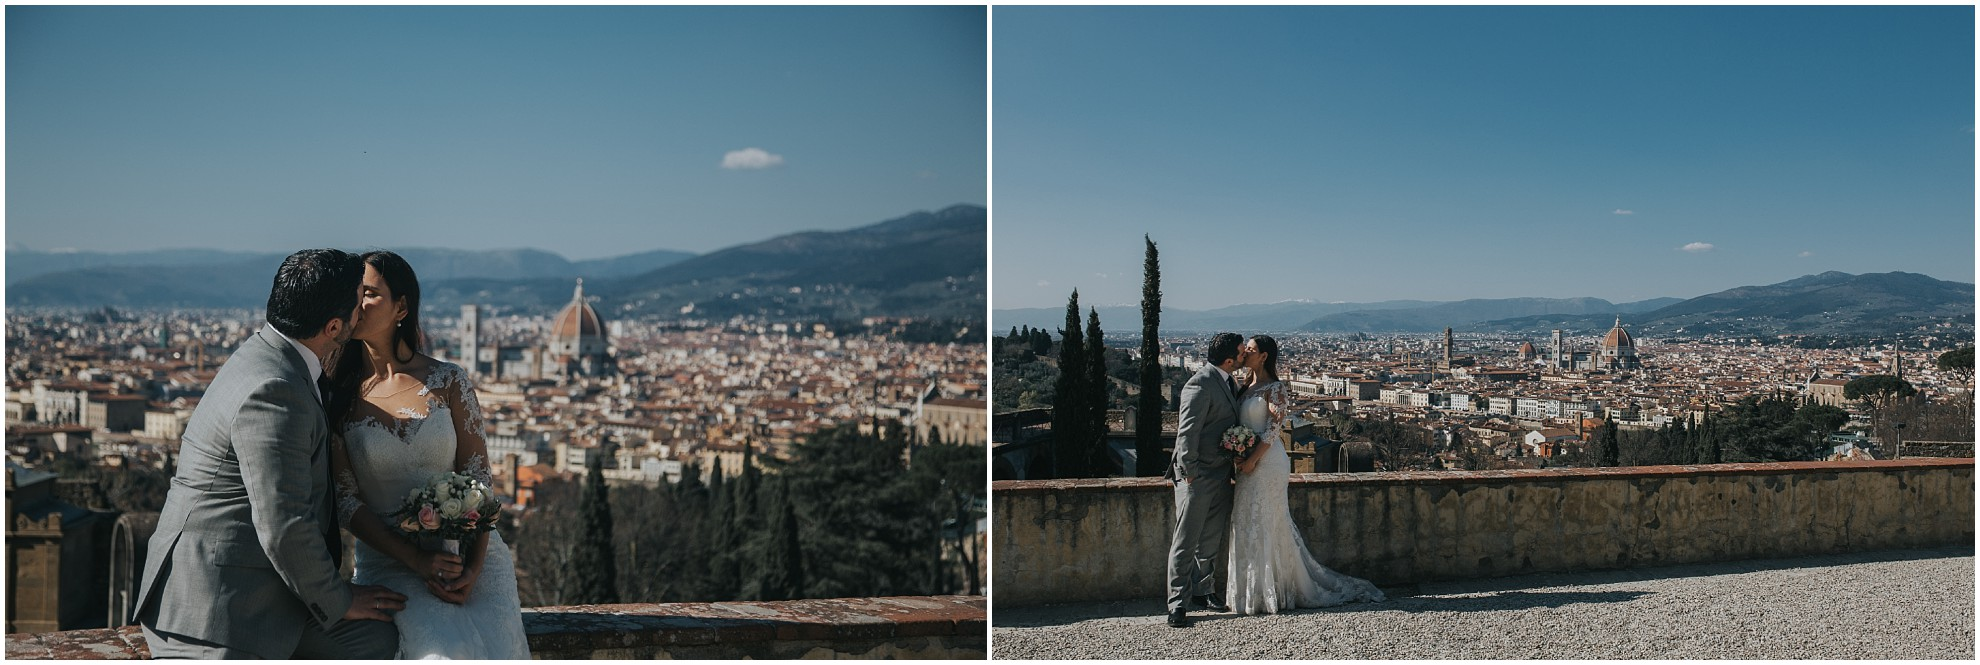 florence-wedding-photographer-040